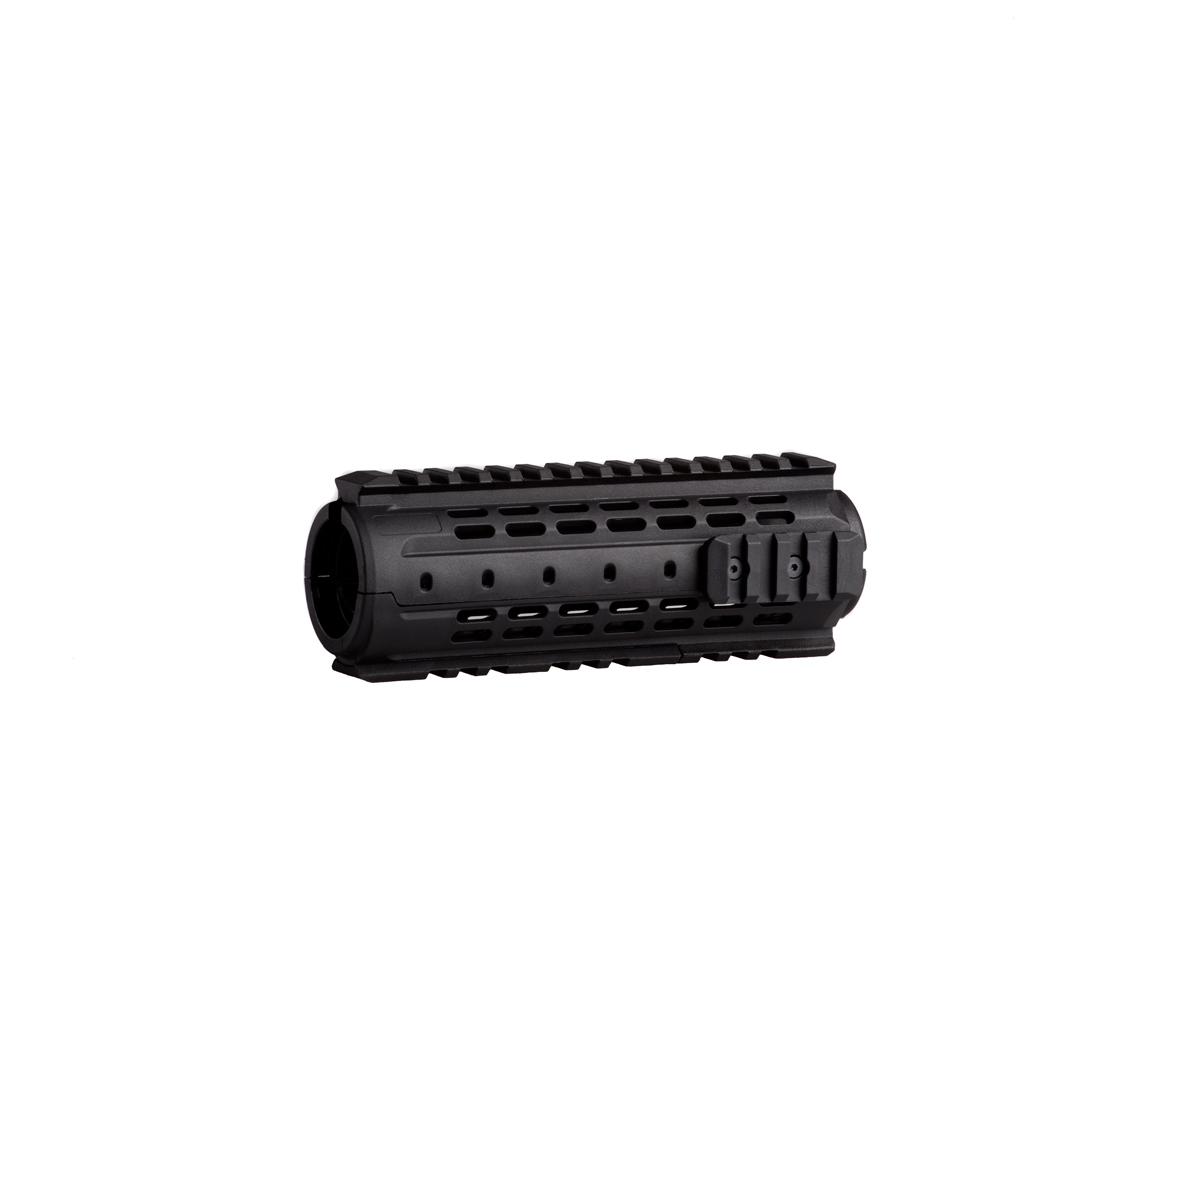 MRS-C - M16/AR15/M4 Modular Rail System Carbine length